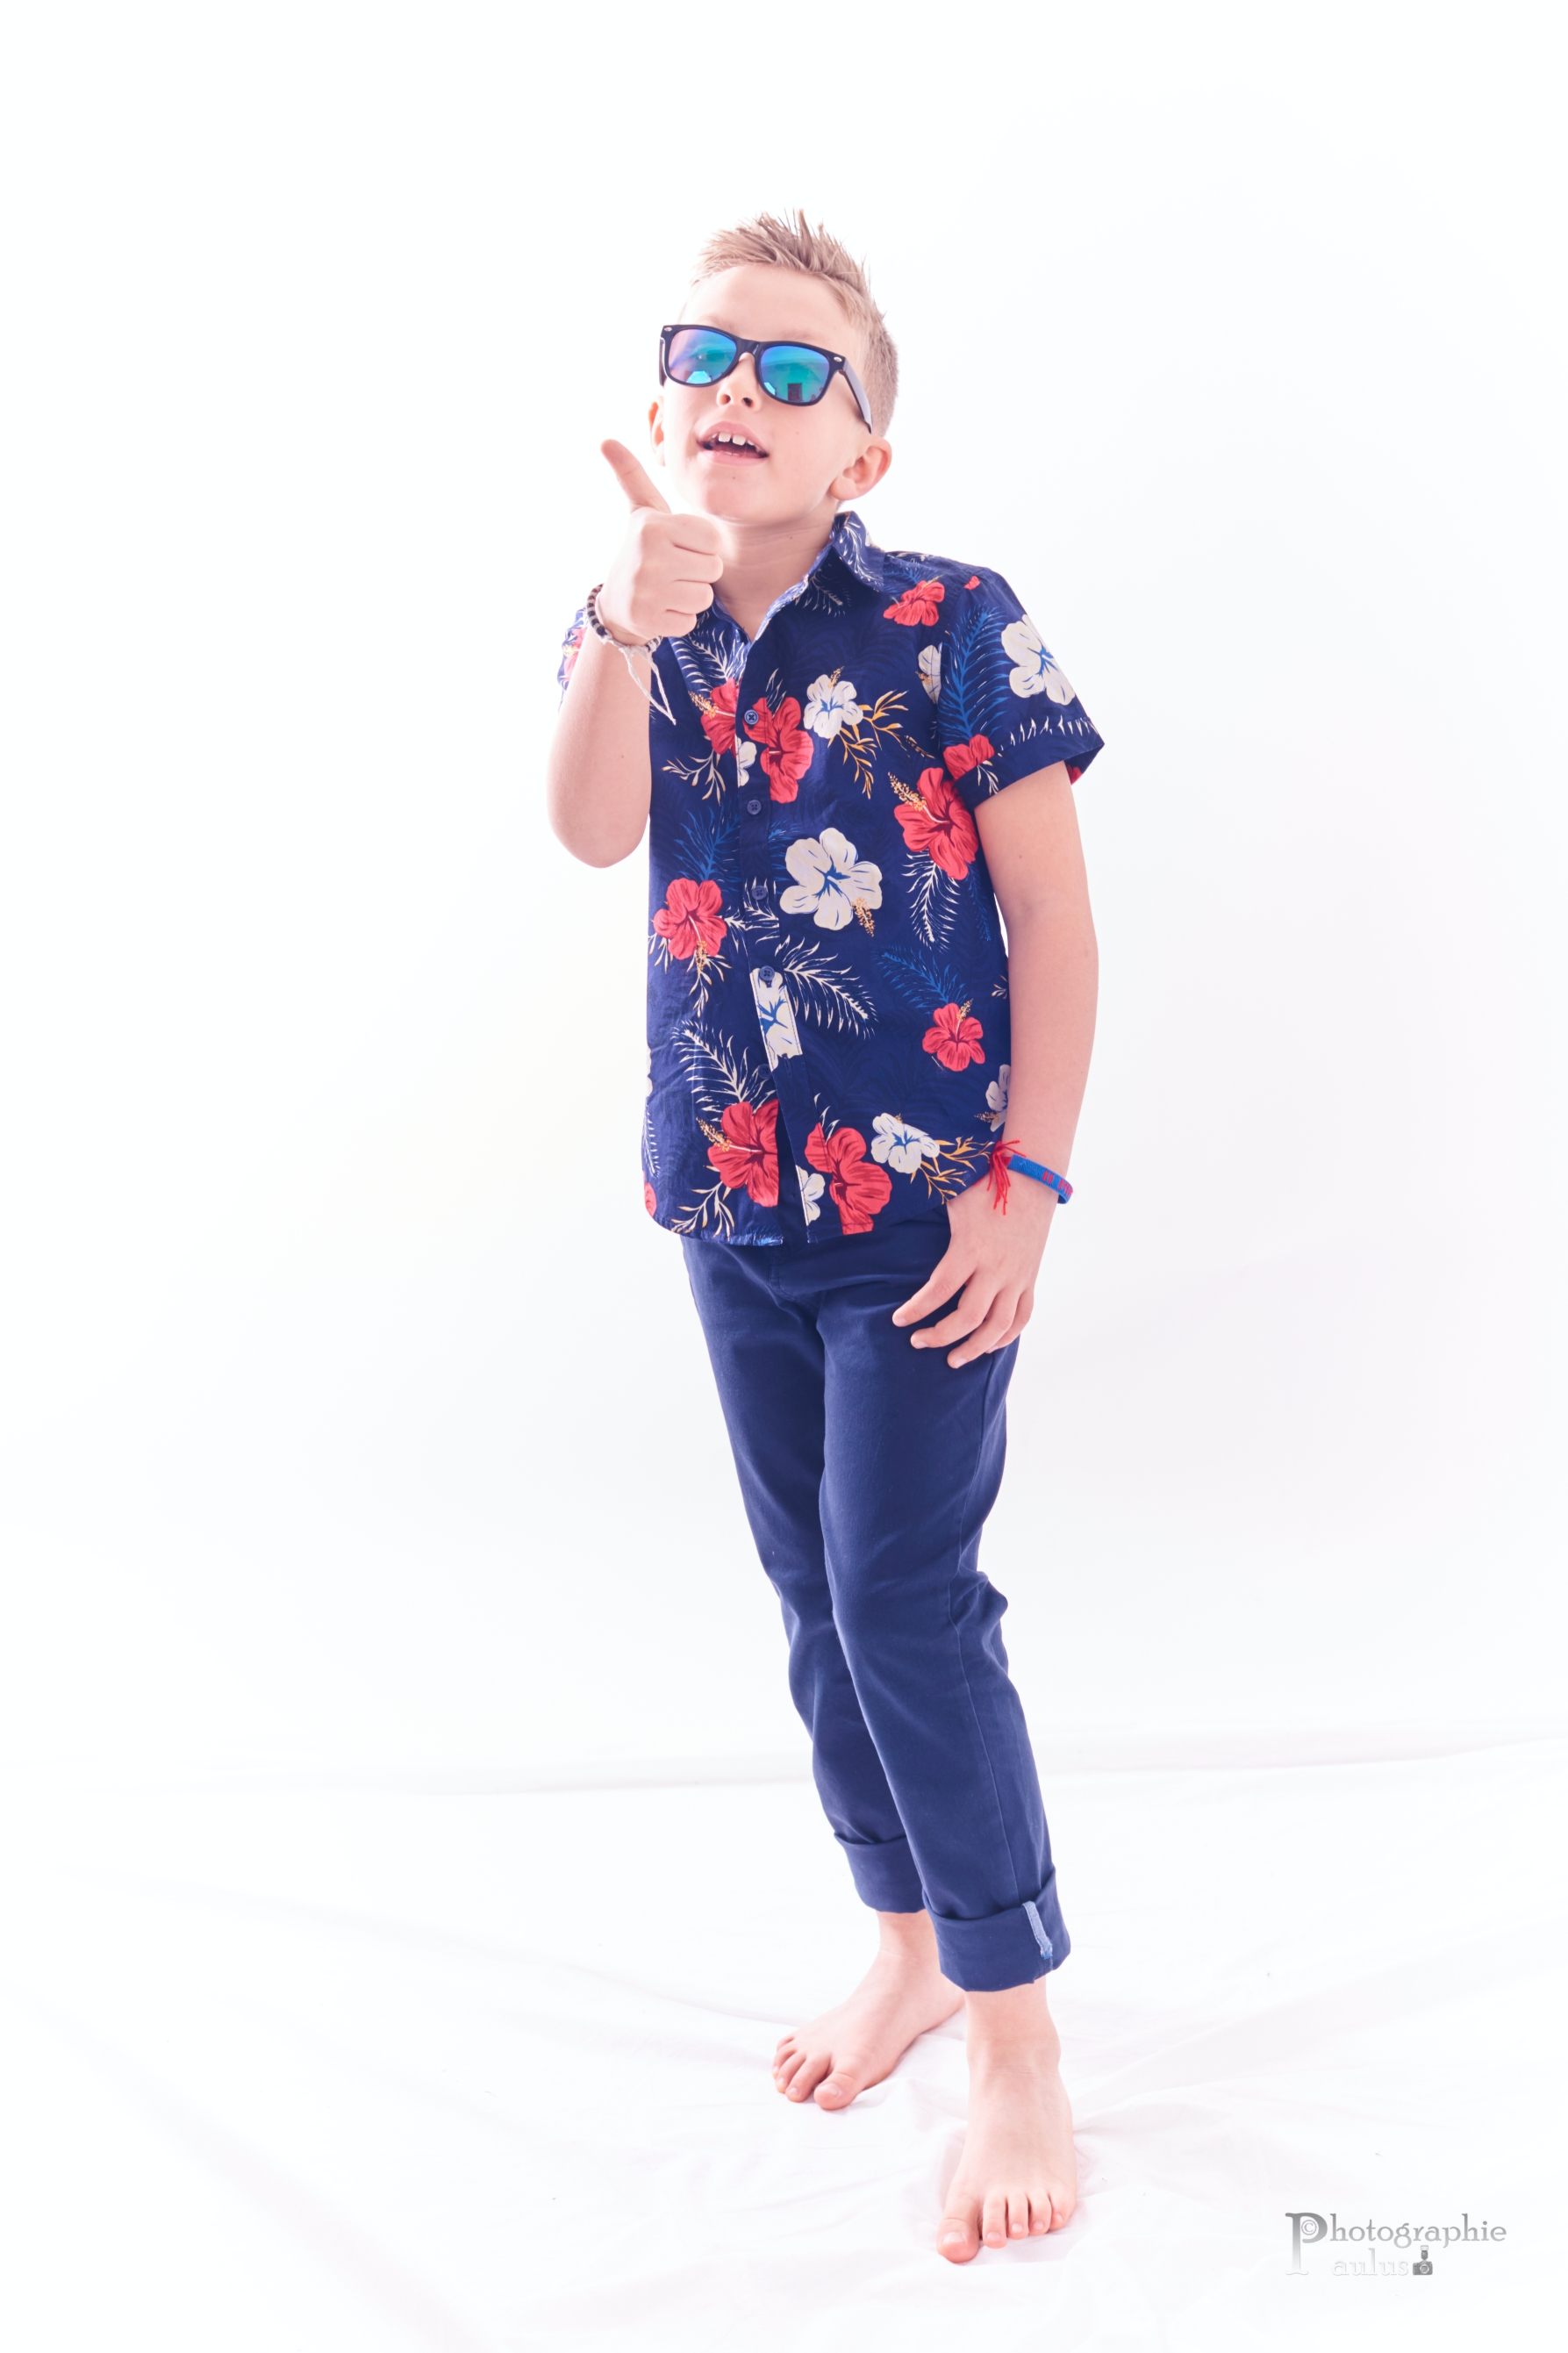 Matteo SBP0048